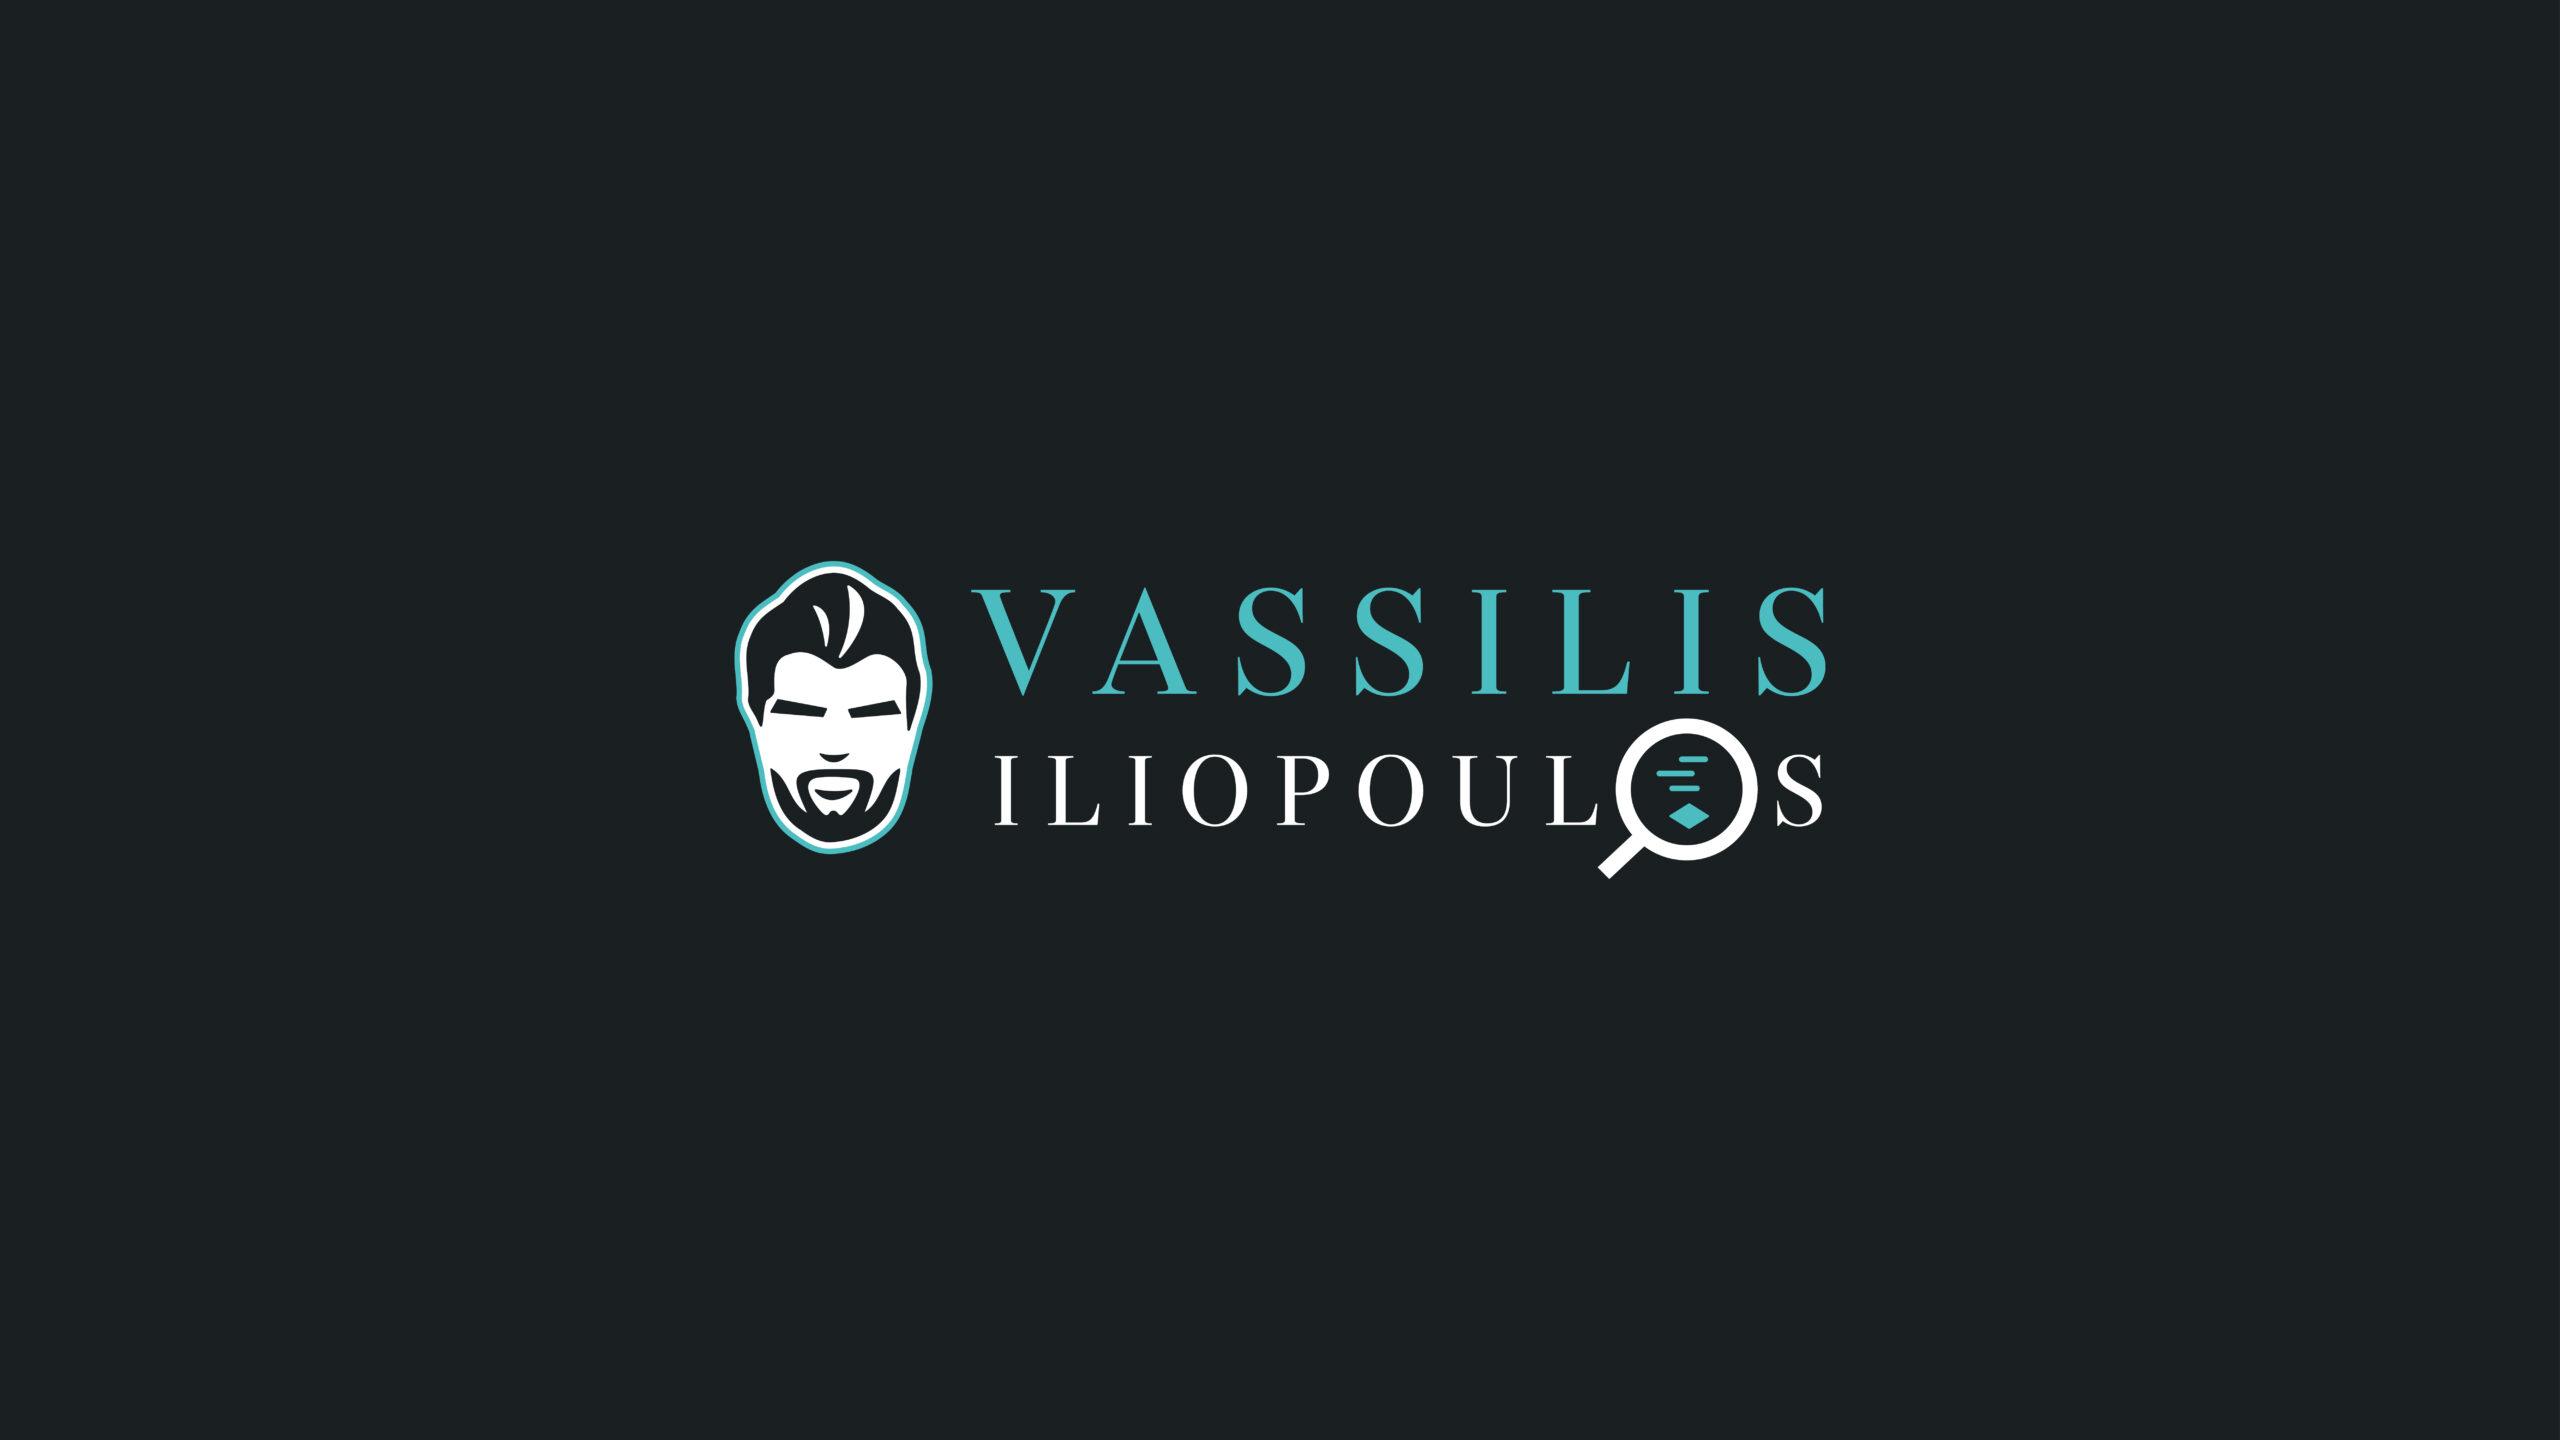 Vassilis logo